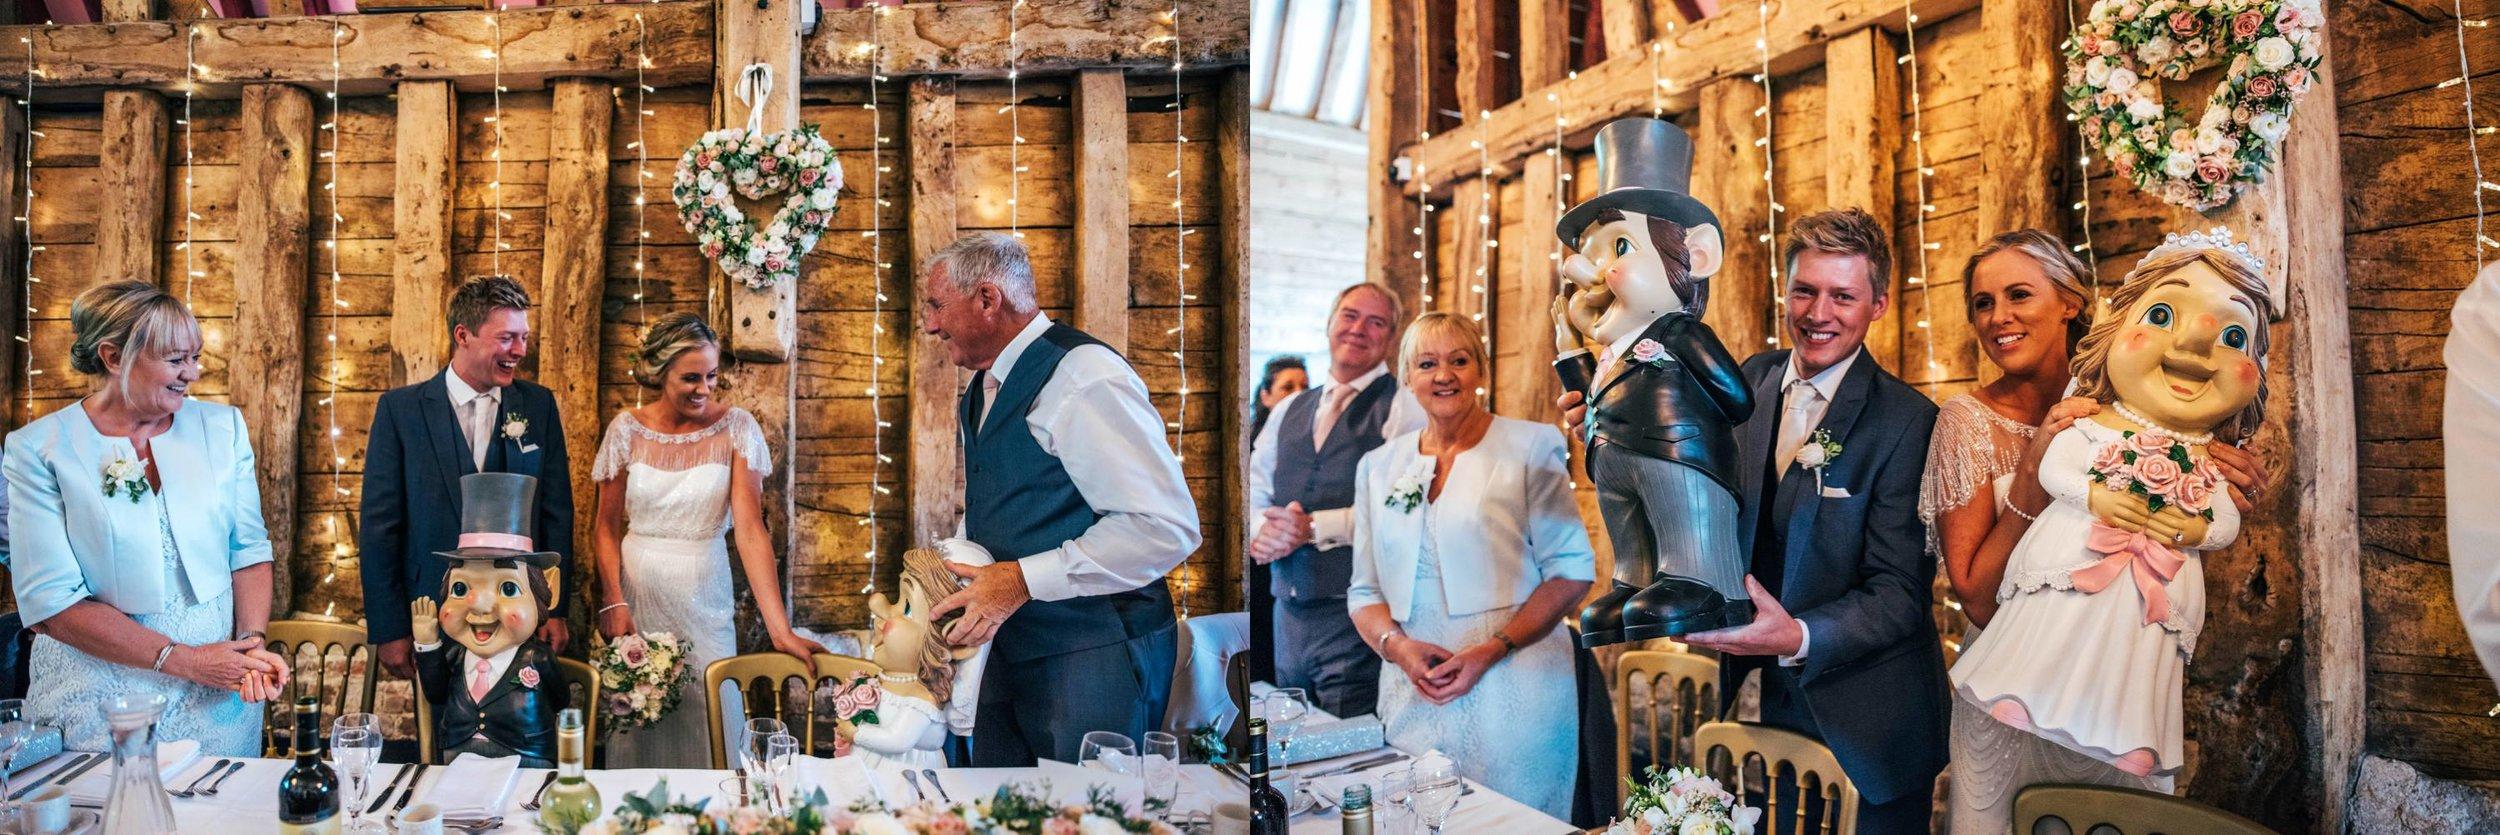 Blush pink rustic barn wedding with touch of elegance, Bride wears Jenny Packham Essex UK Documentary Wedding Photographer